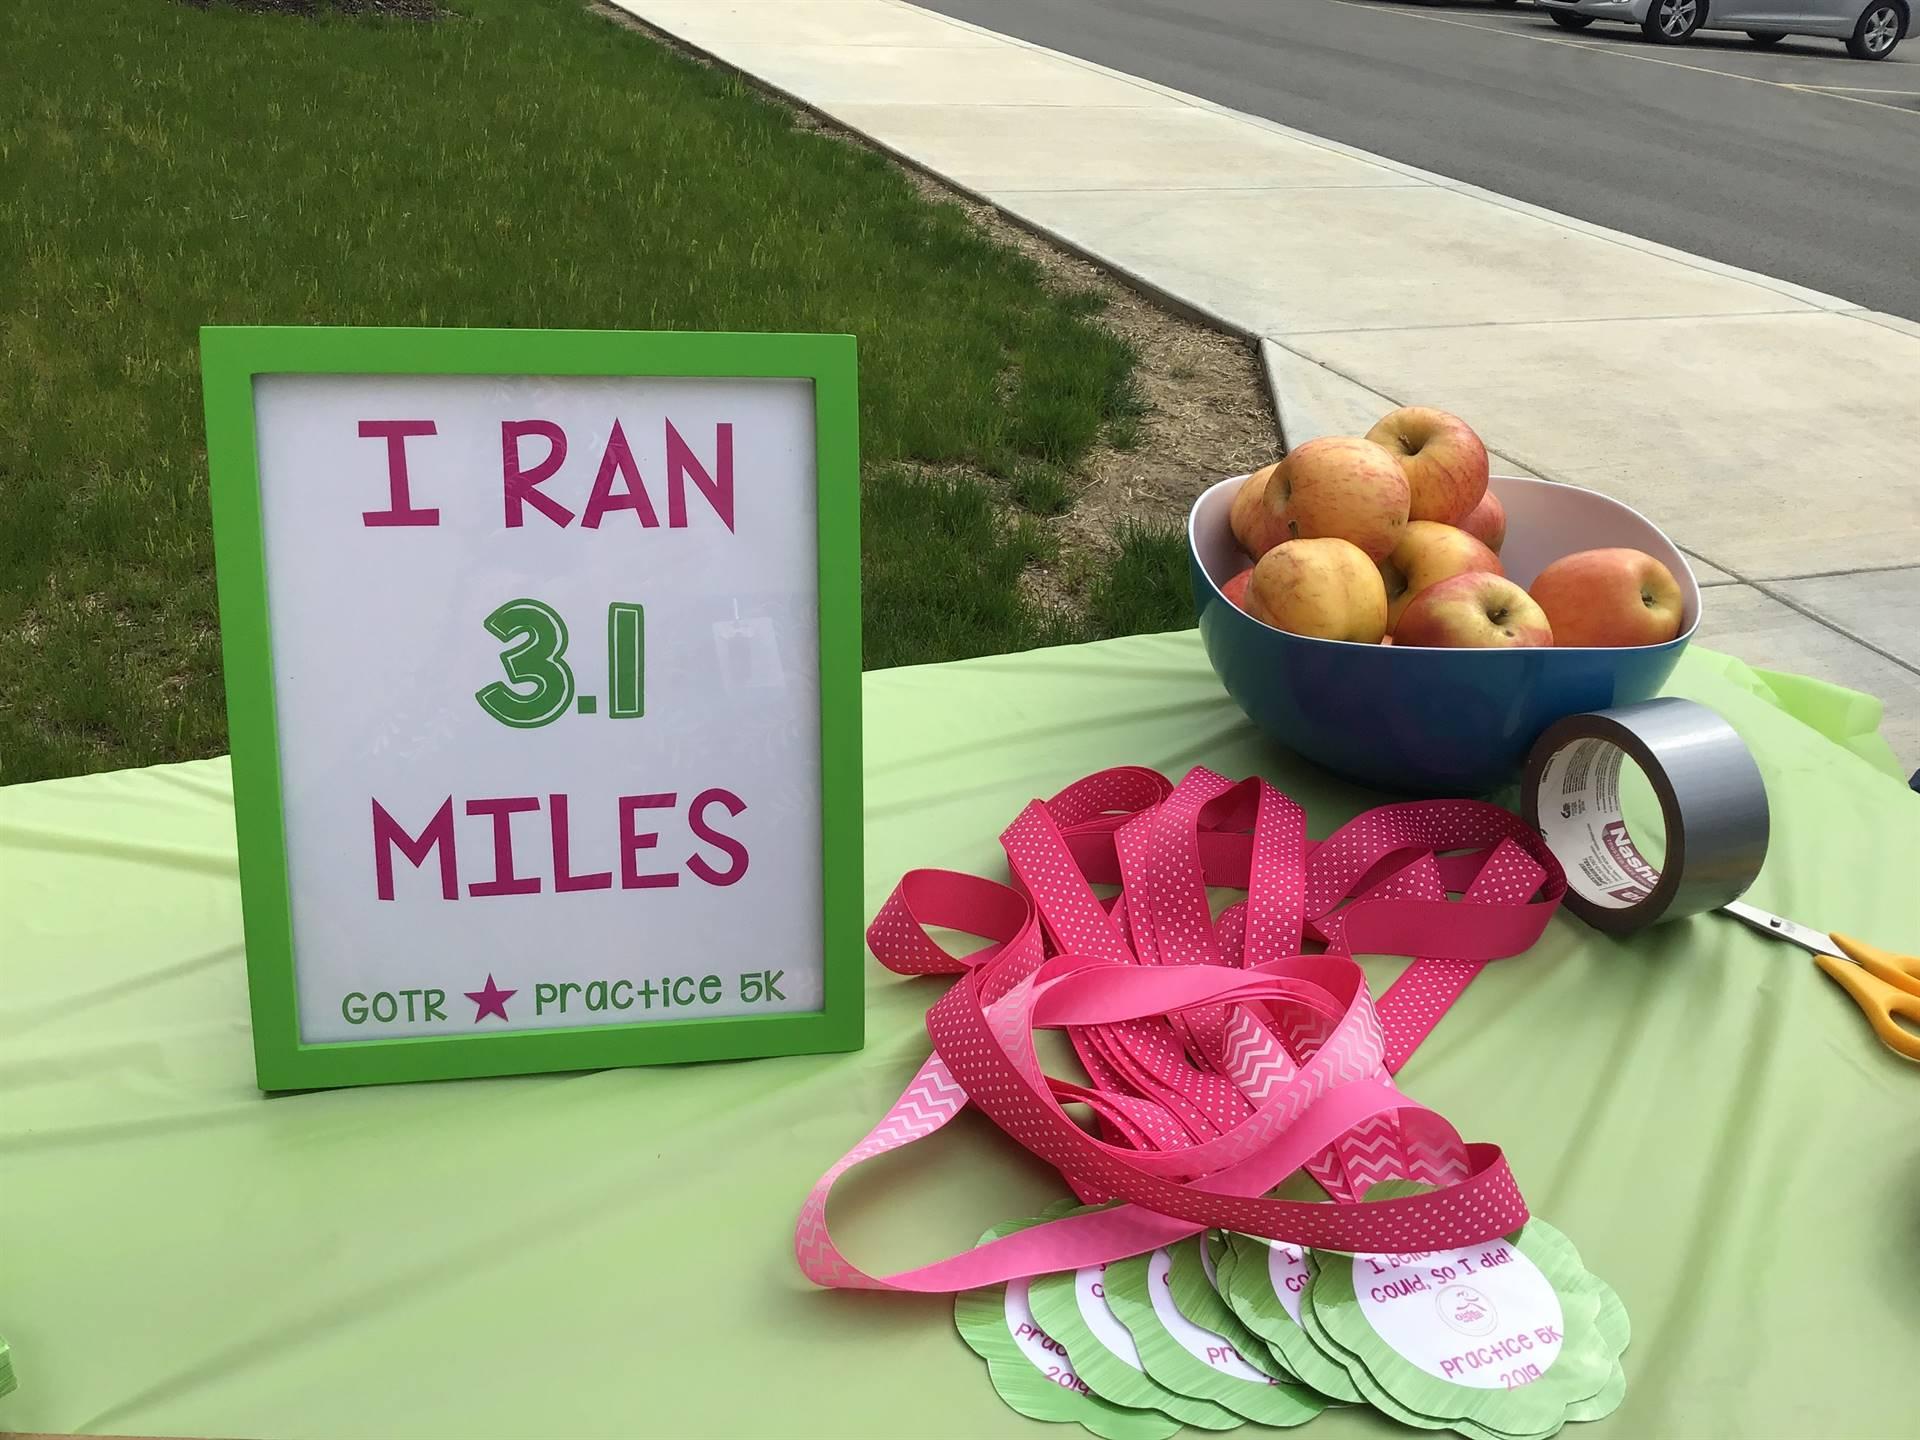 I ran 3.1 miles